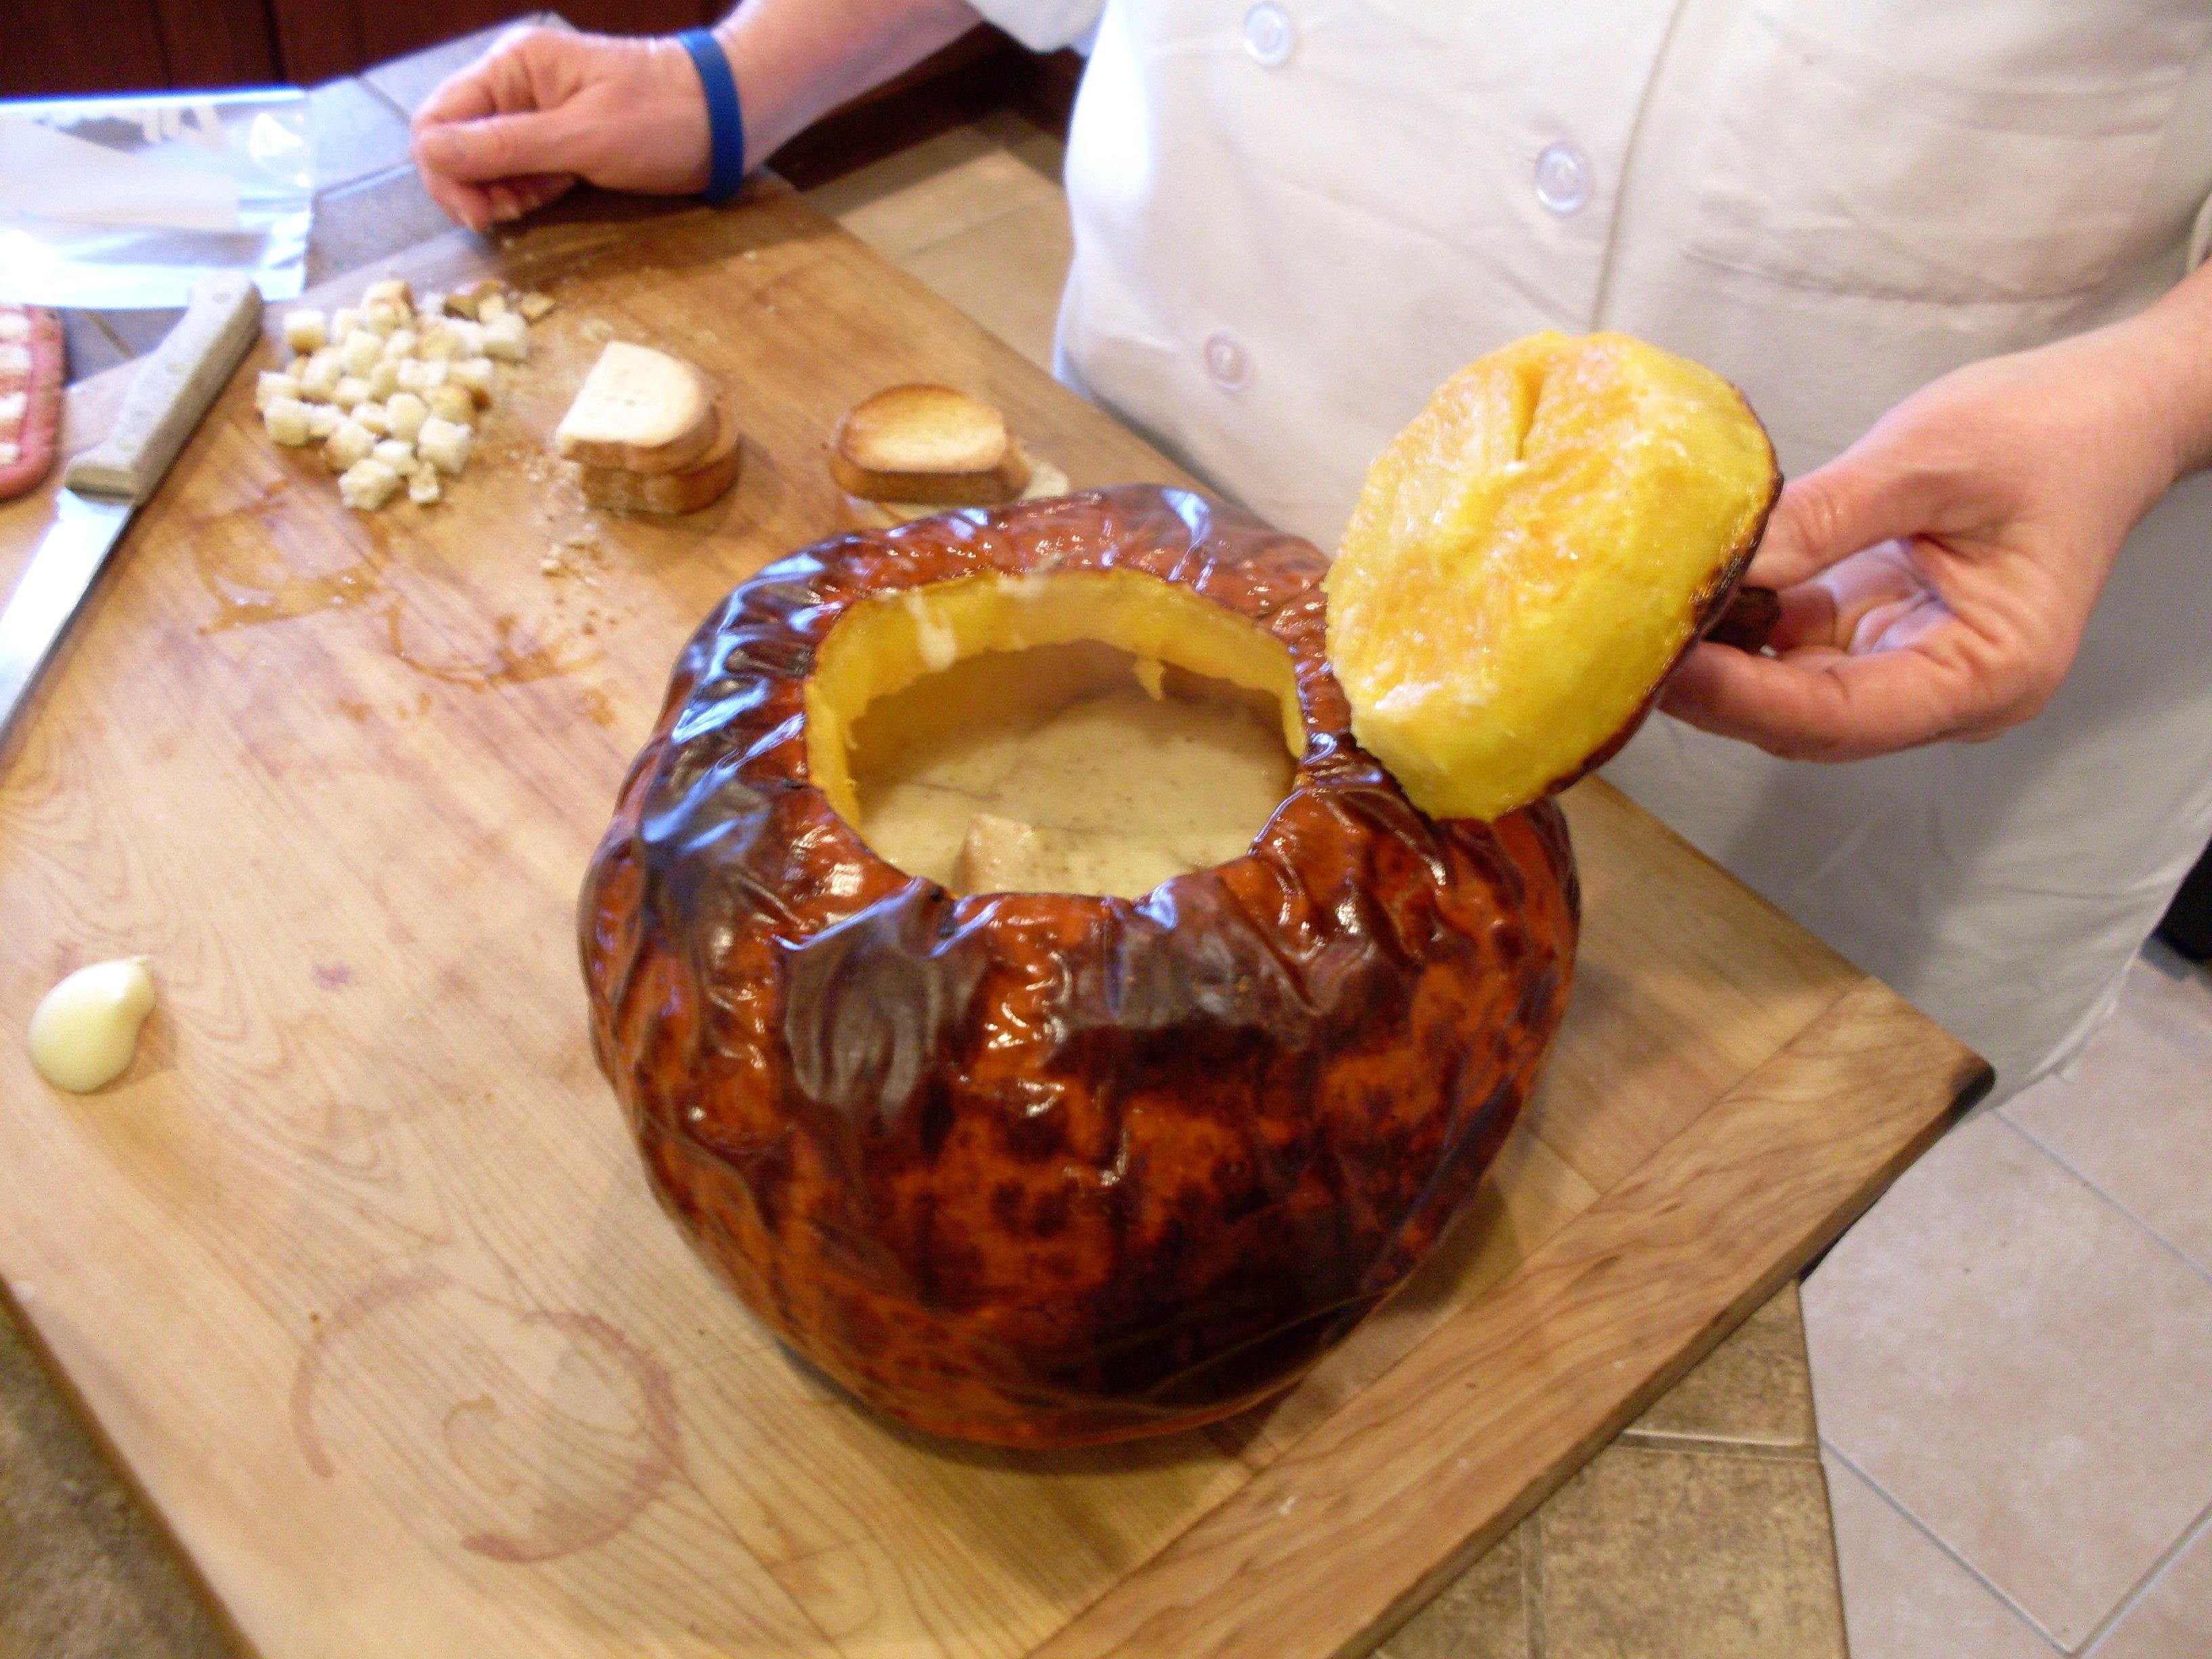 cave-aged « Cheesemonger's Weblog